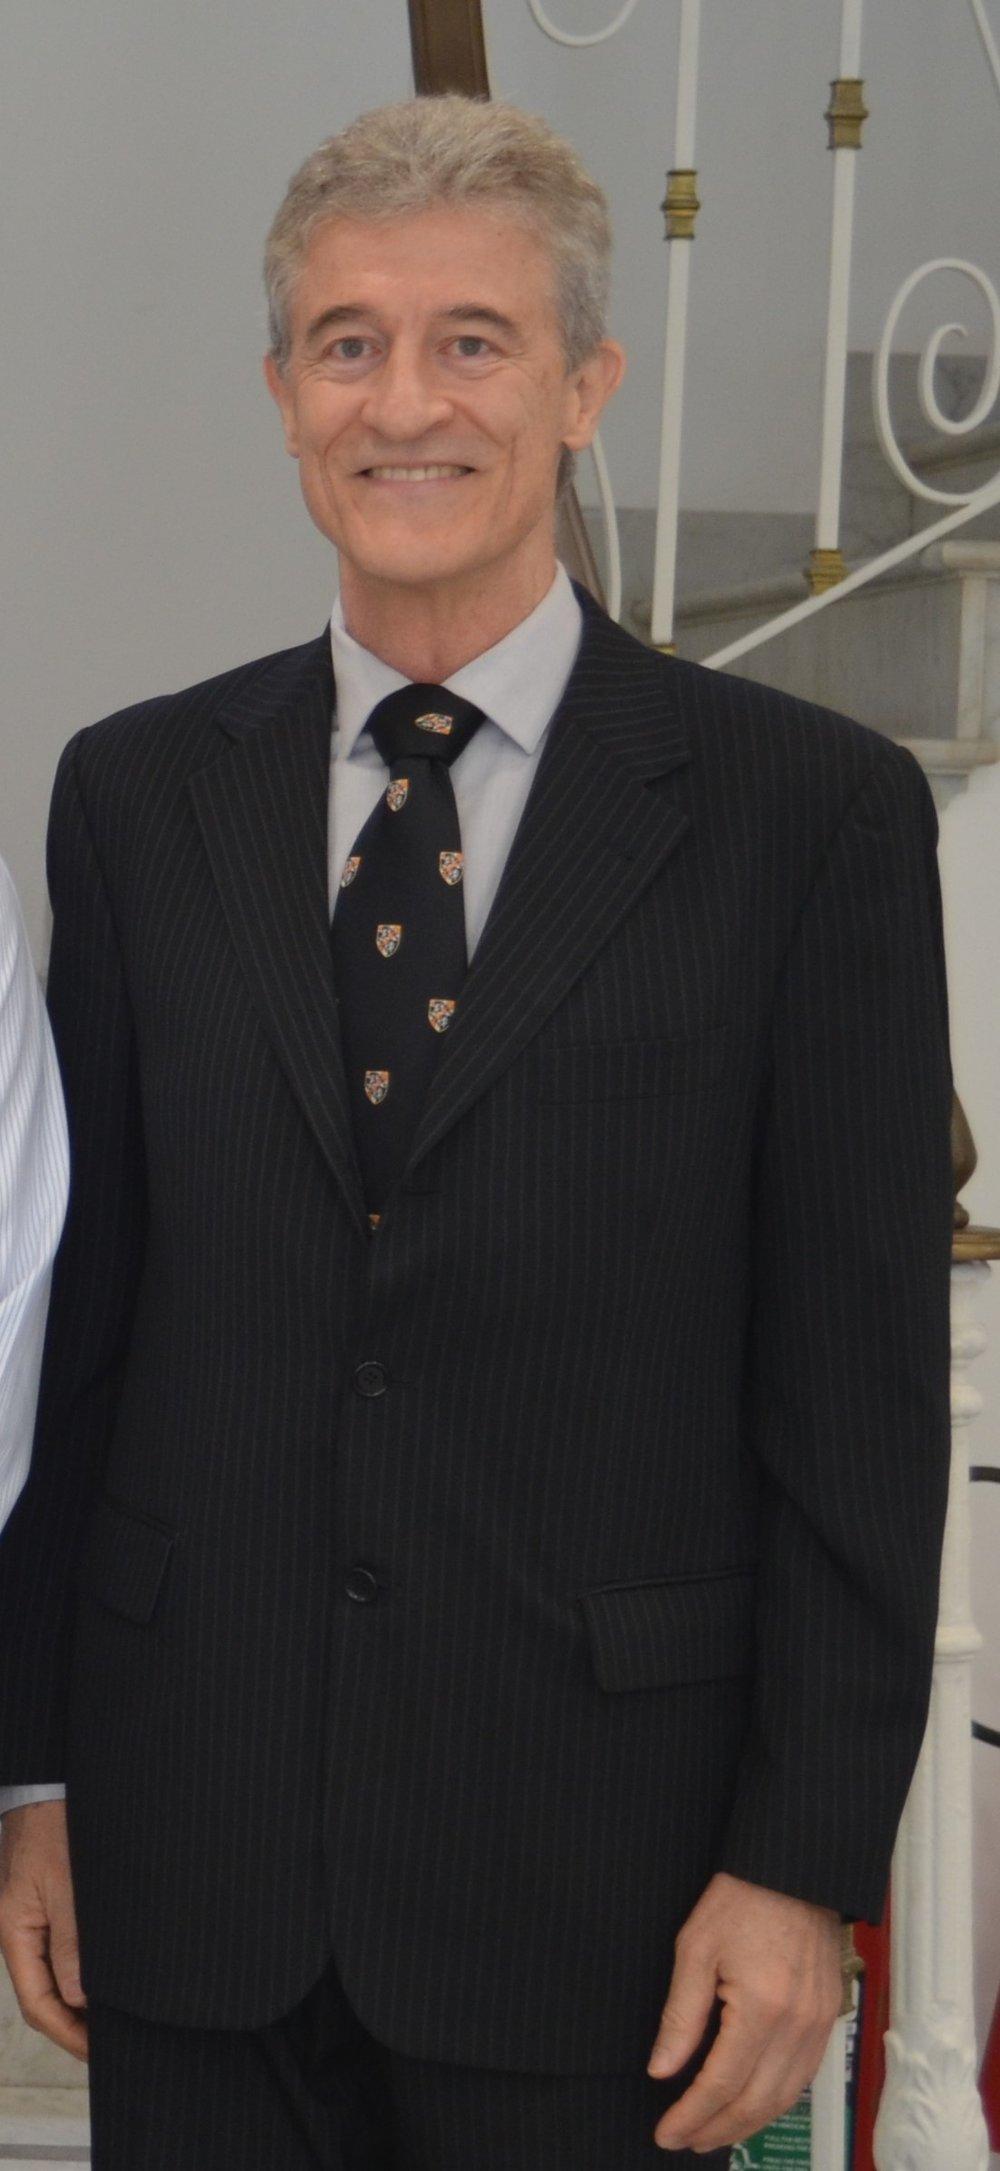 Professor Jorge Biolchini